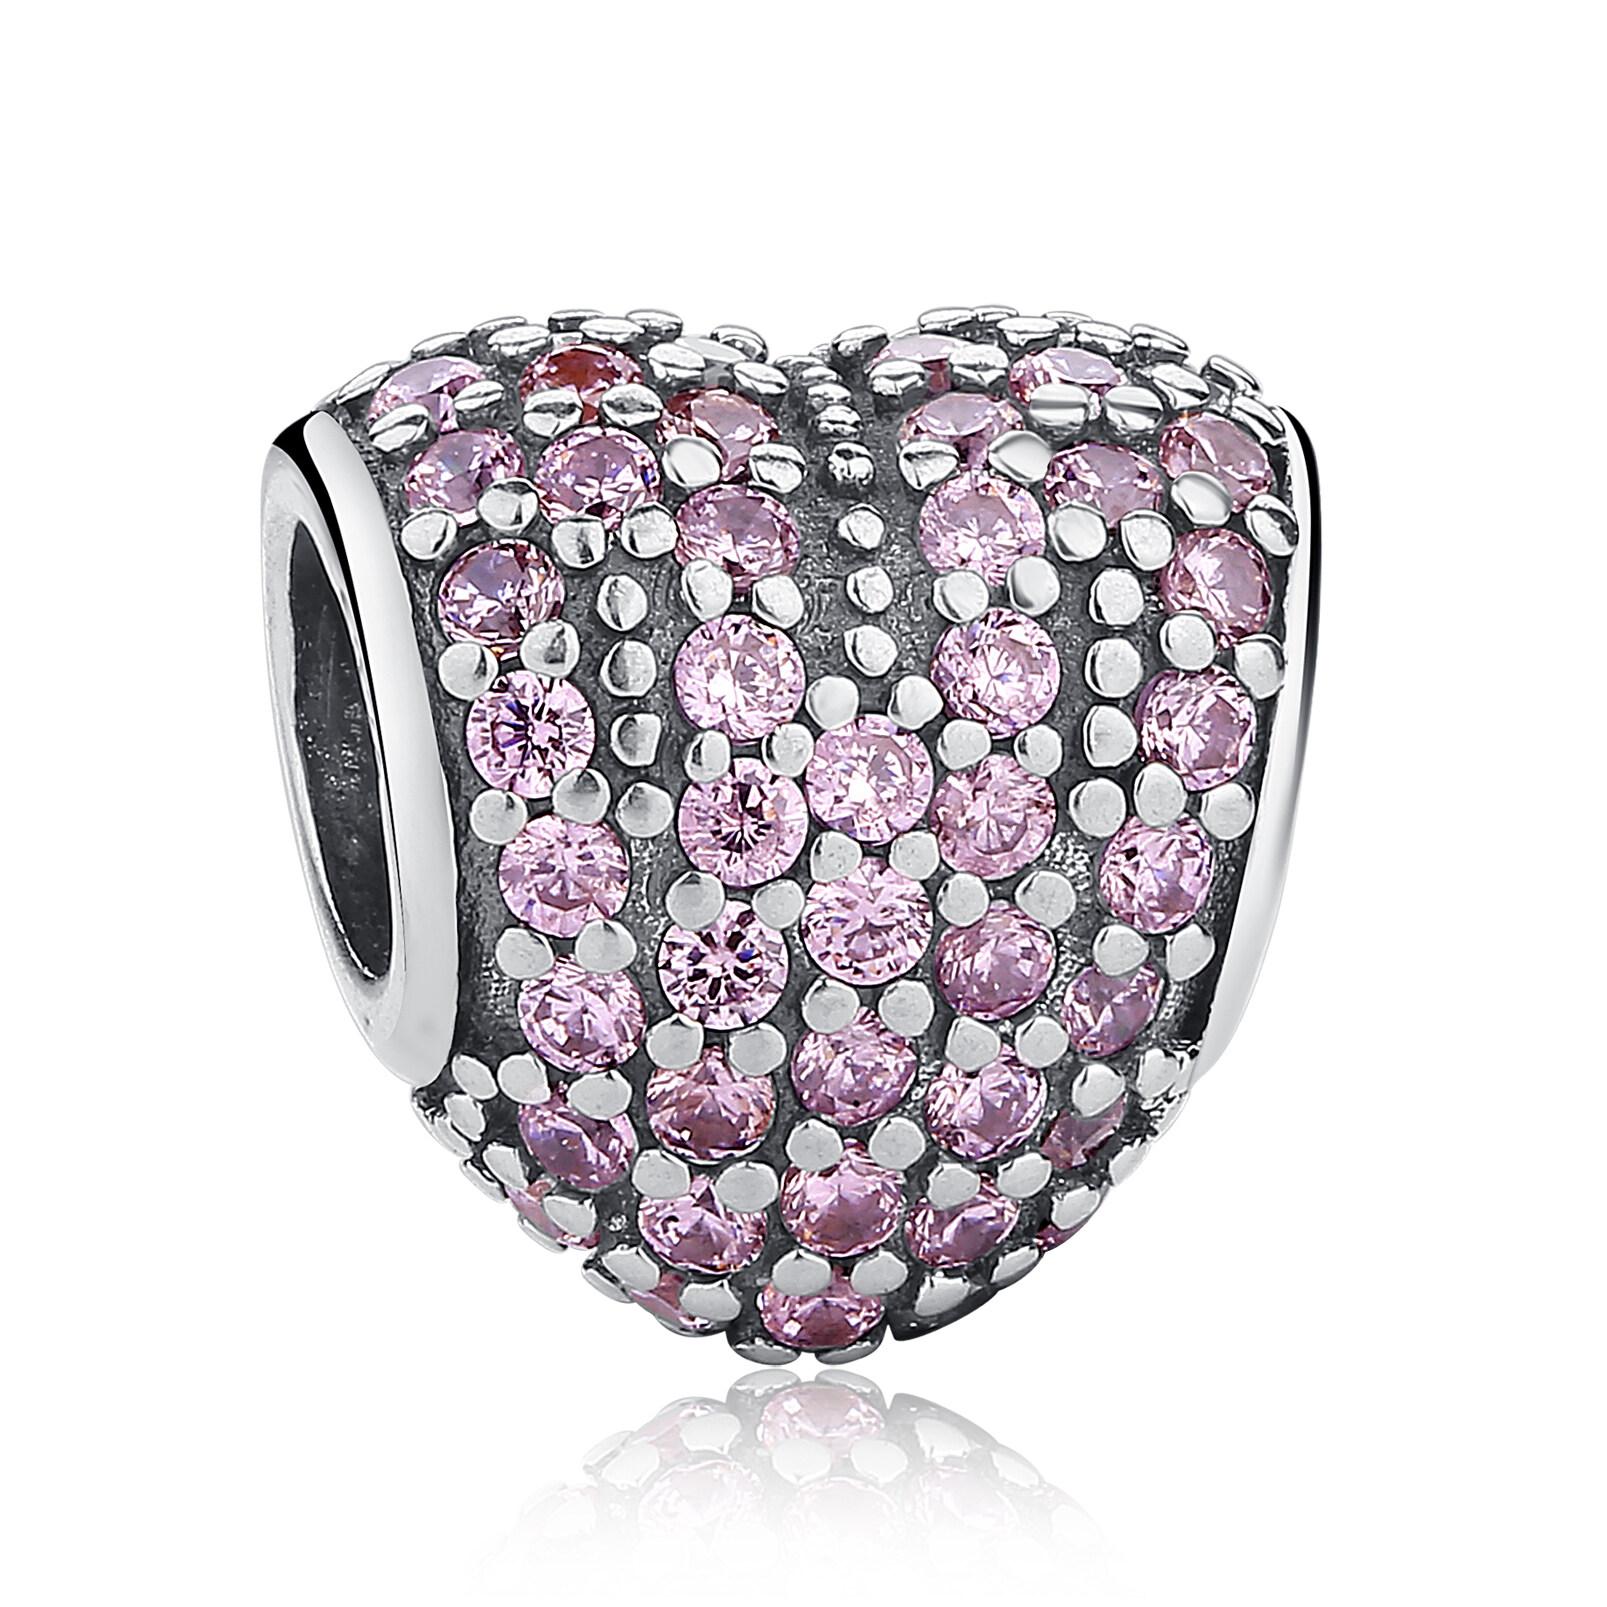 Jual Hadiah Untuk Kekasih Yang Mempesona 925 Sterling Silver Heart Shape Charm Fit Gelang Dengan Pink Cubic Zirkonia Perhiasan Membuat Pas055 Baru